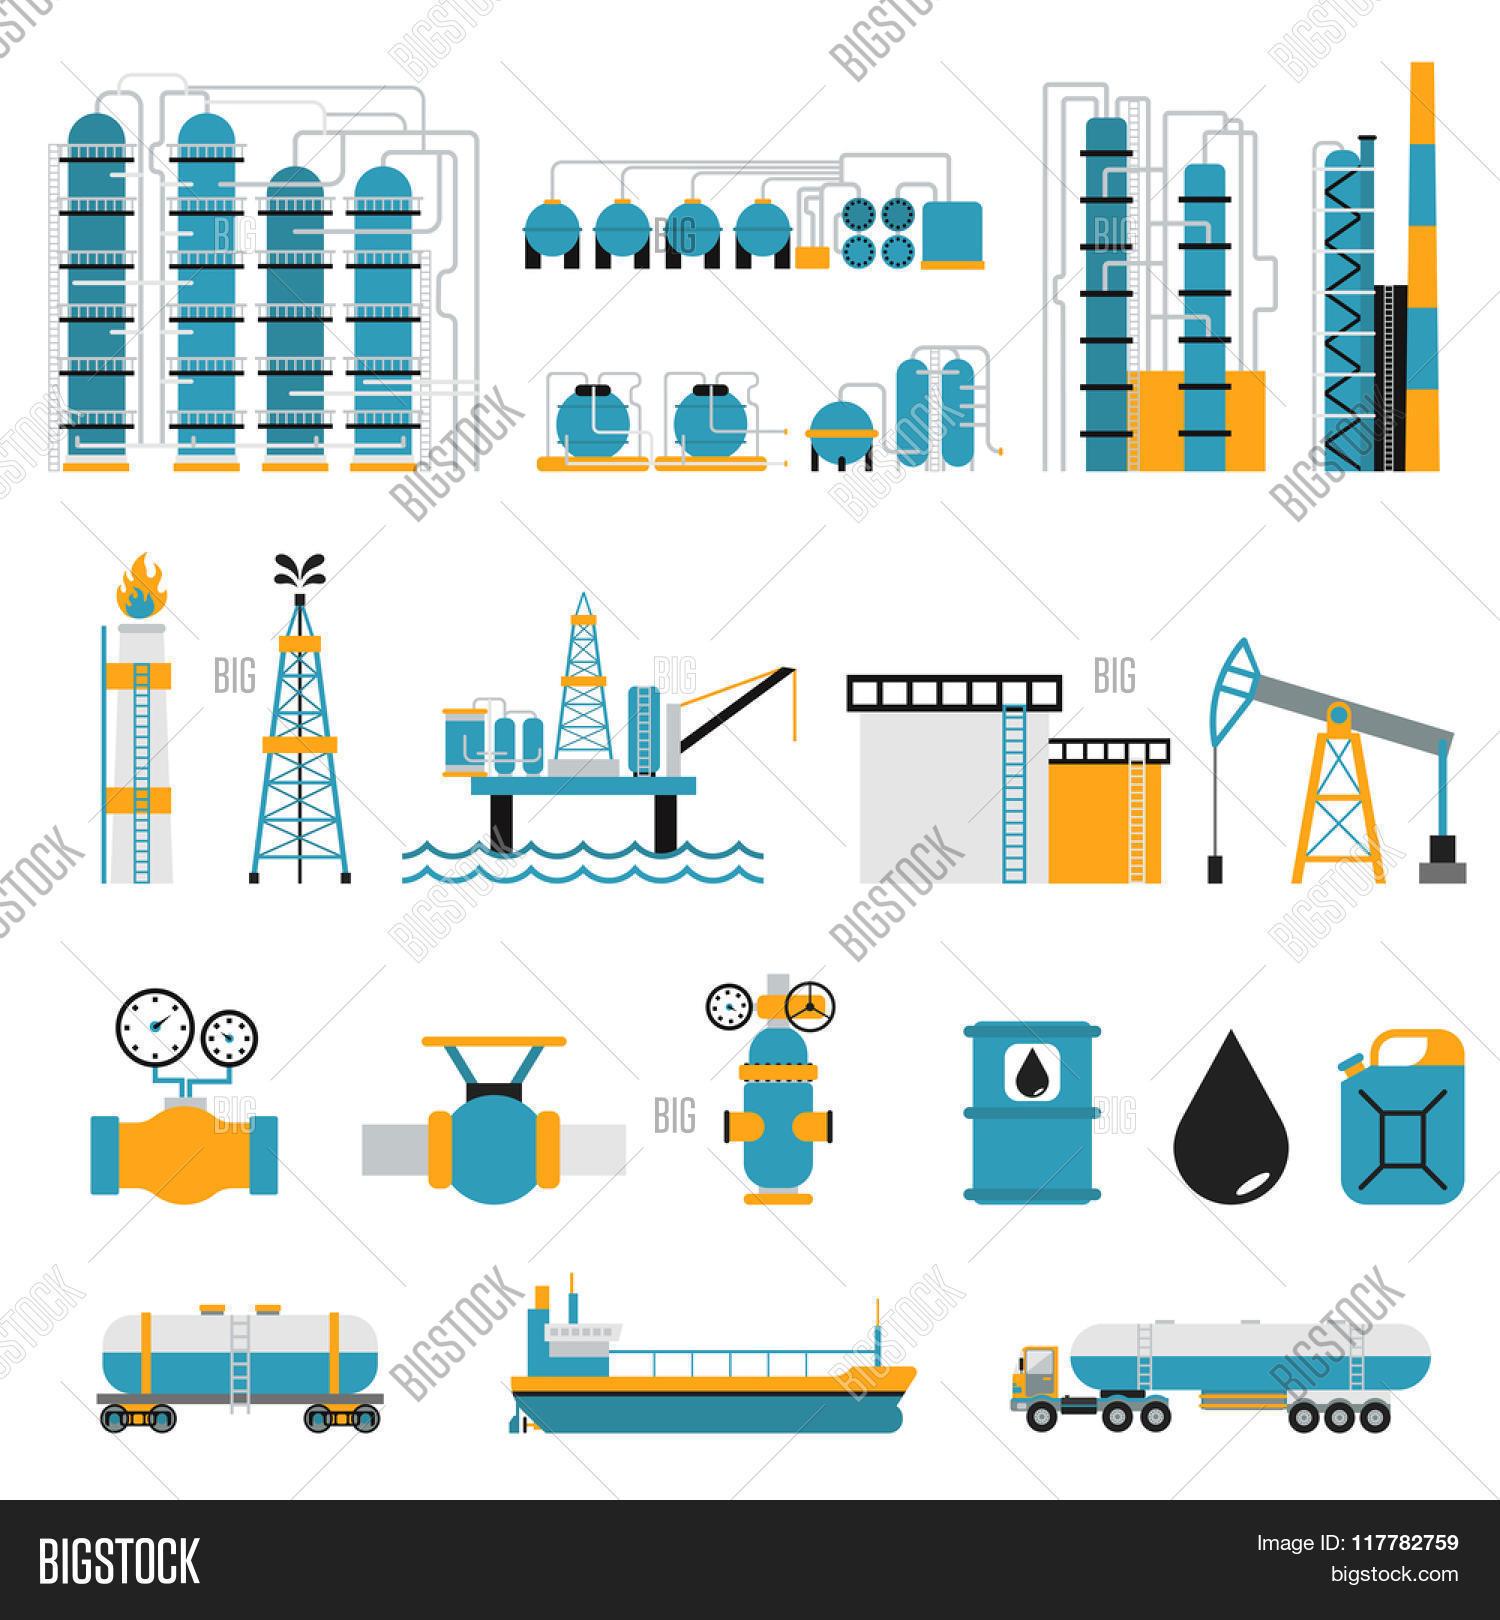 Production symbols biocorpaavc